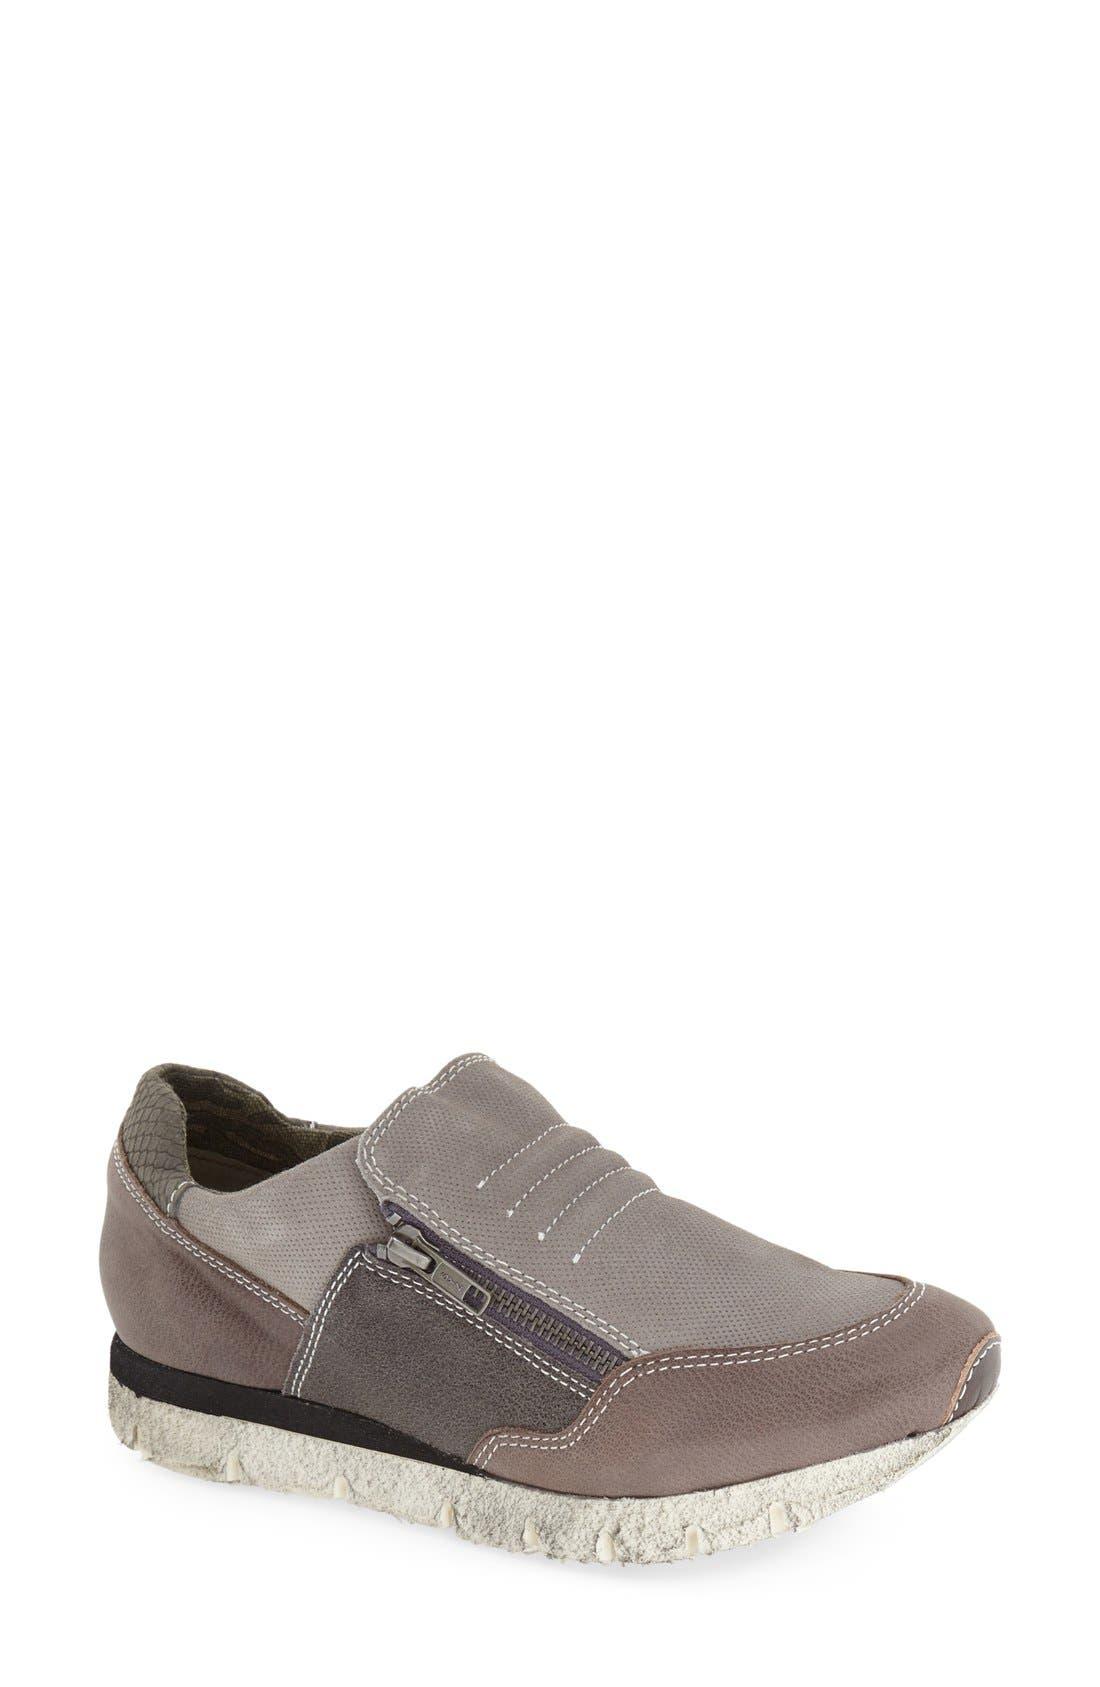 Main Image - OTBT'Sewell' Sneaker (Women)